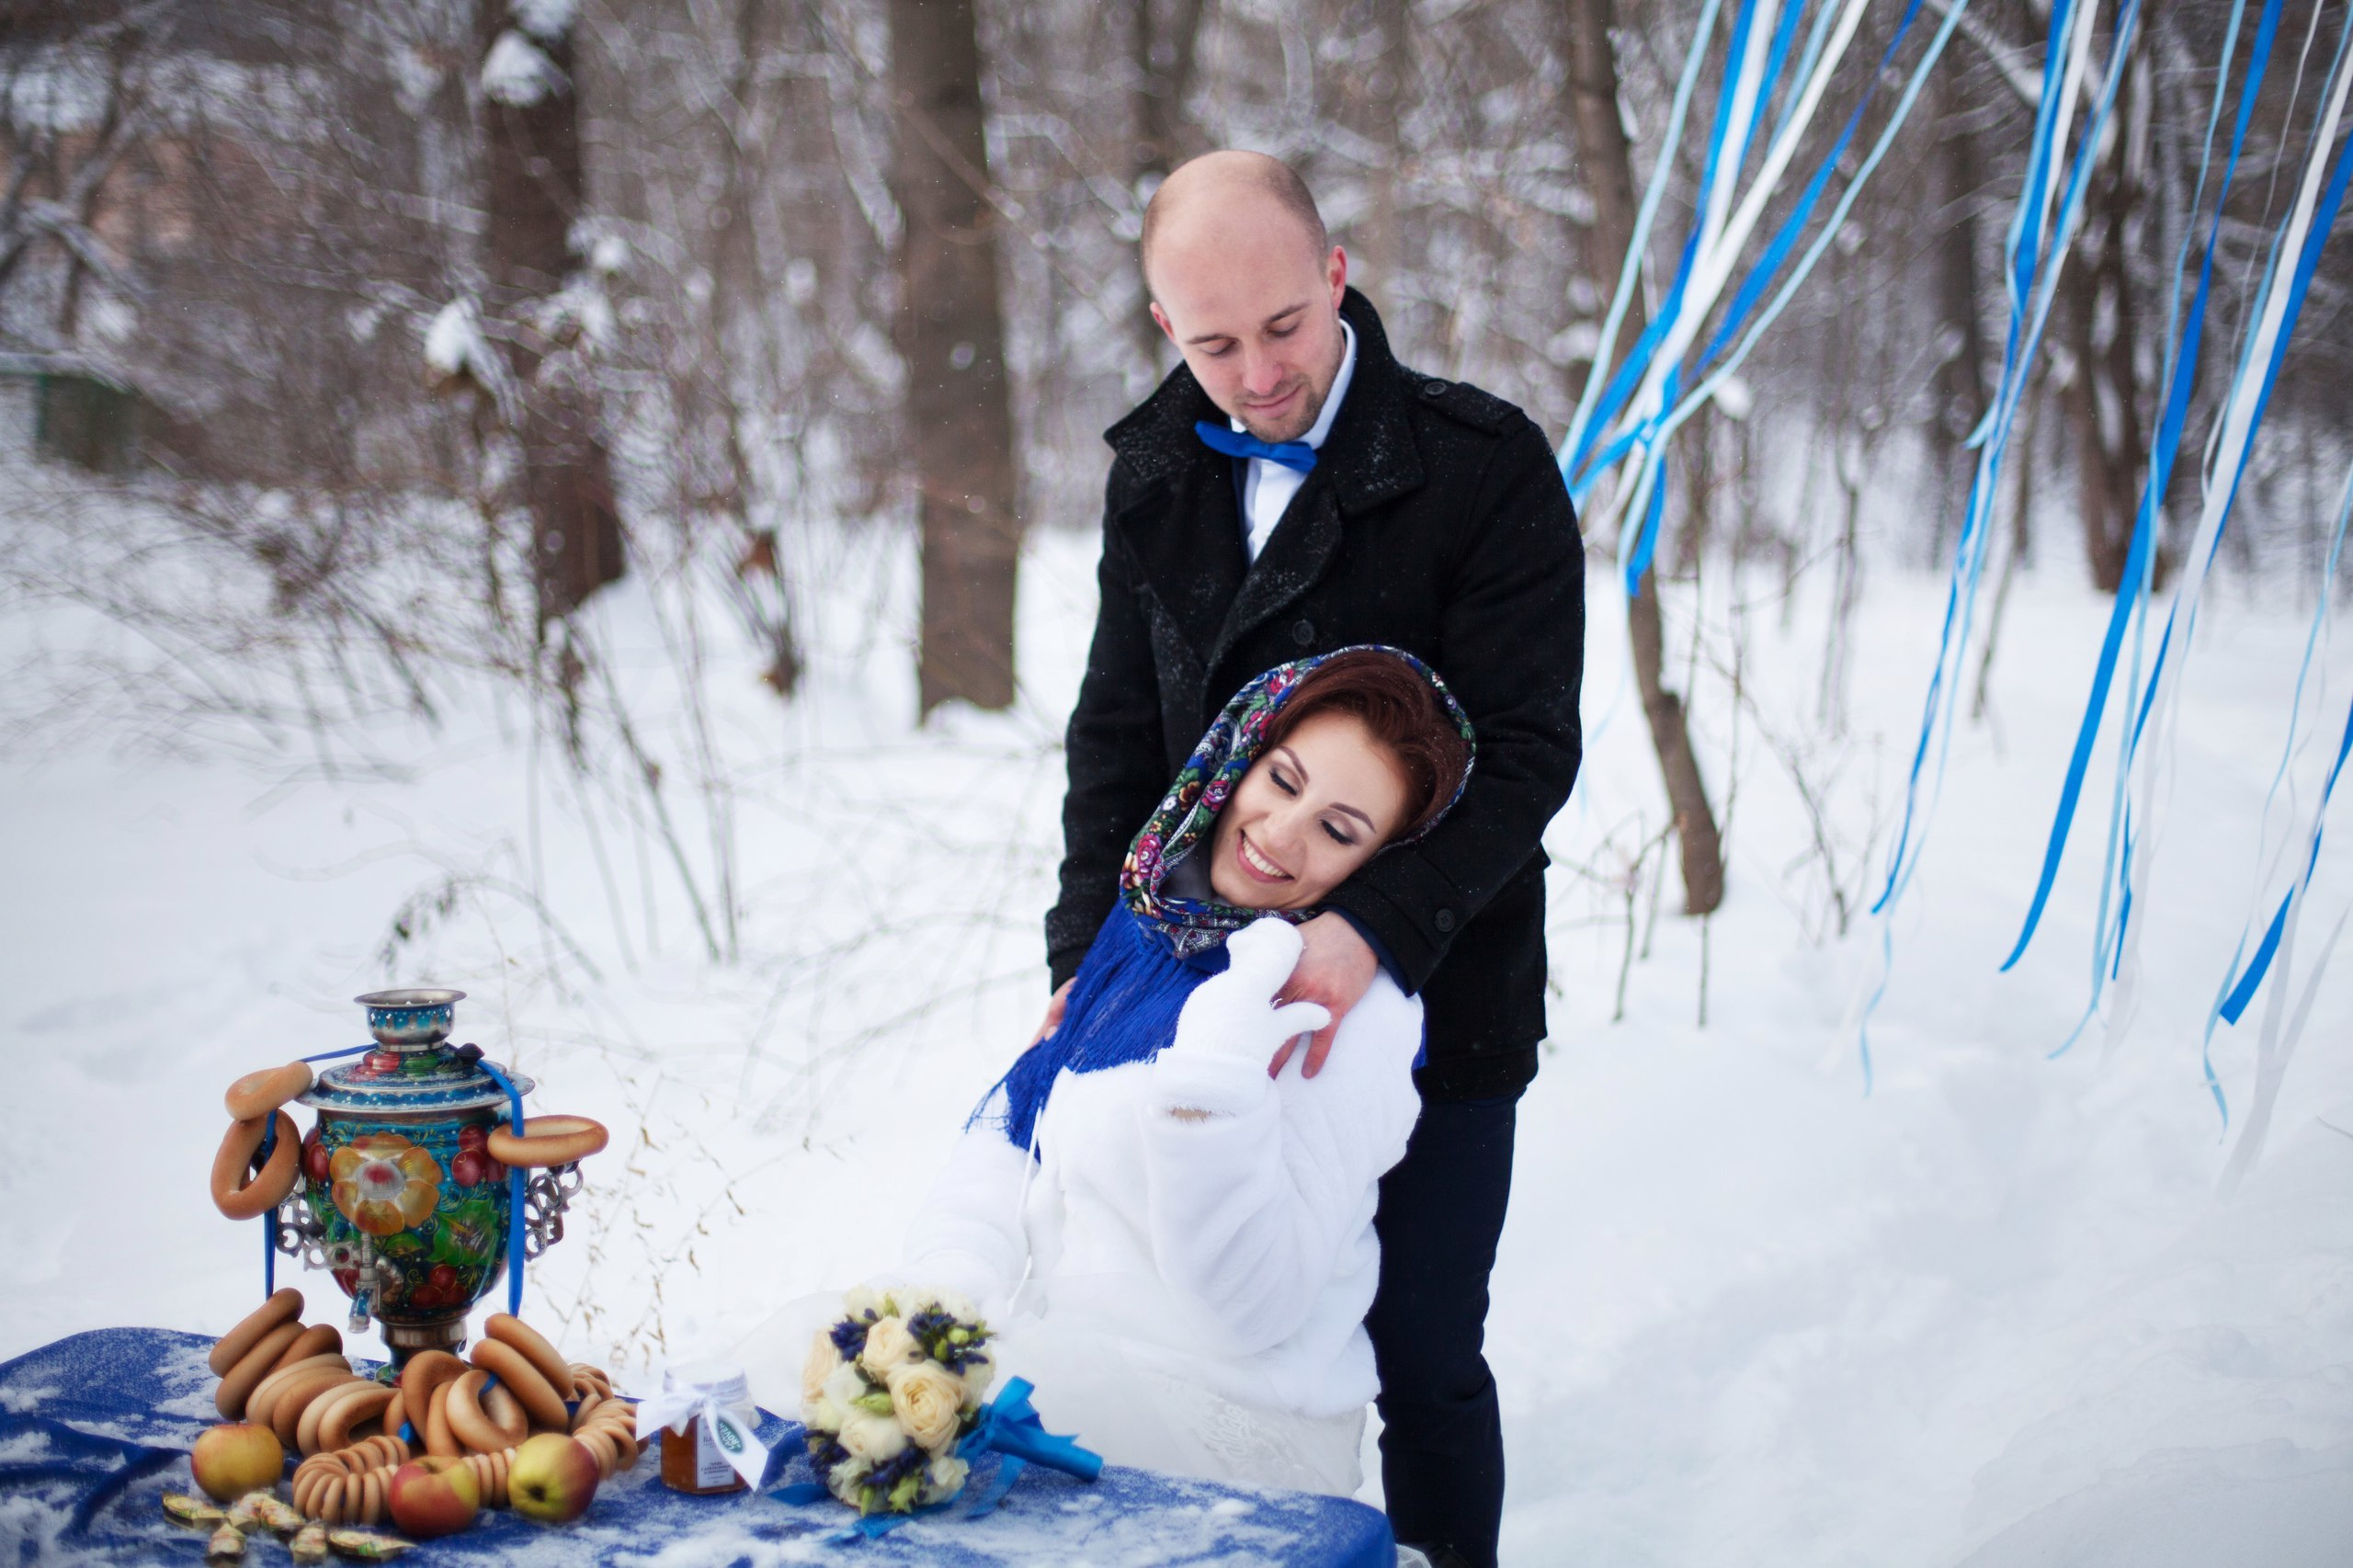 keYVZJ3T3g - Как сократить бюджет свадьбы